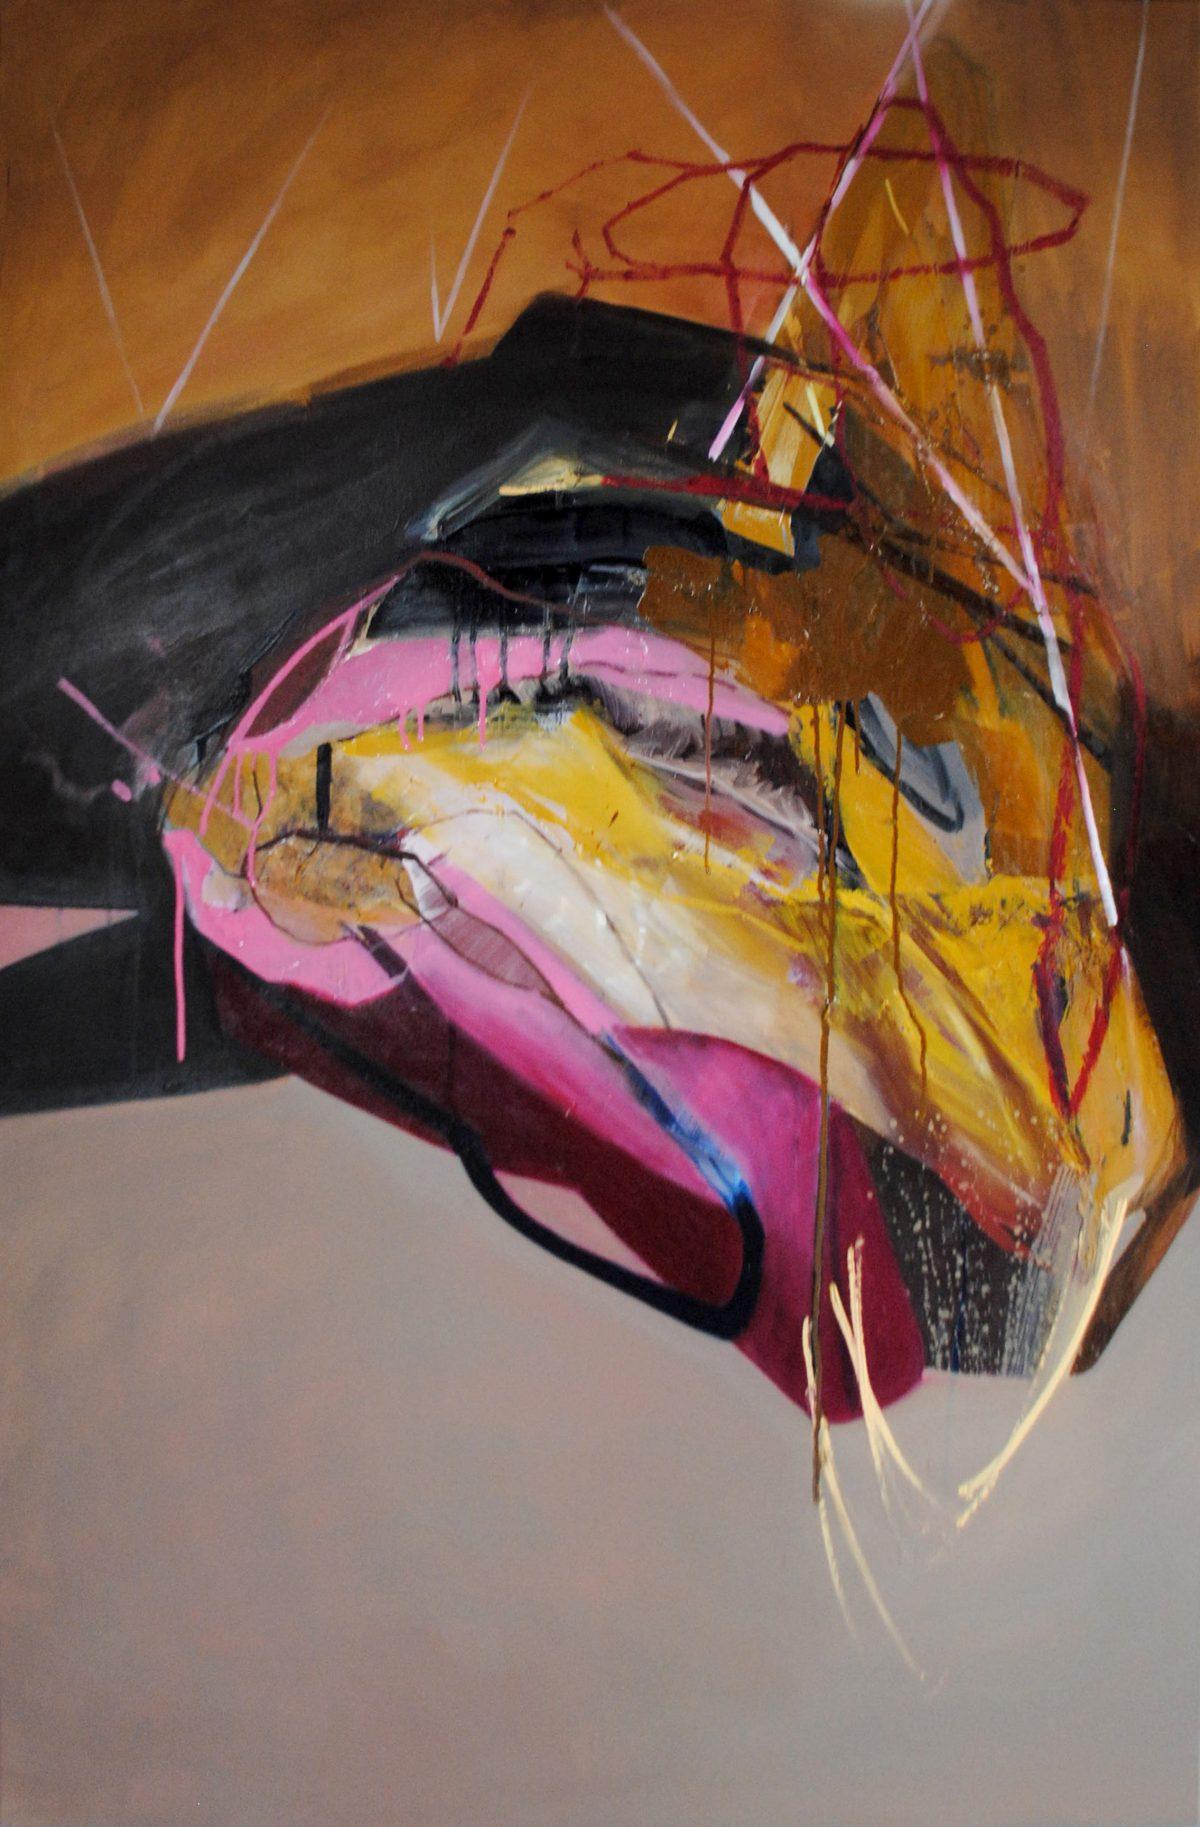 Fragments 8, acrylic and oil on canvas, 2019, 100x150 cm